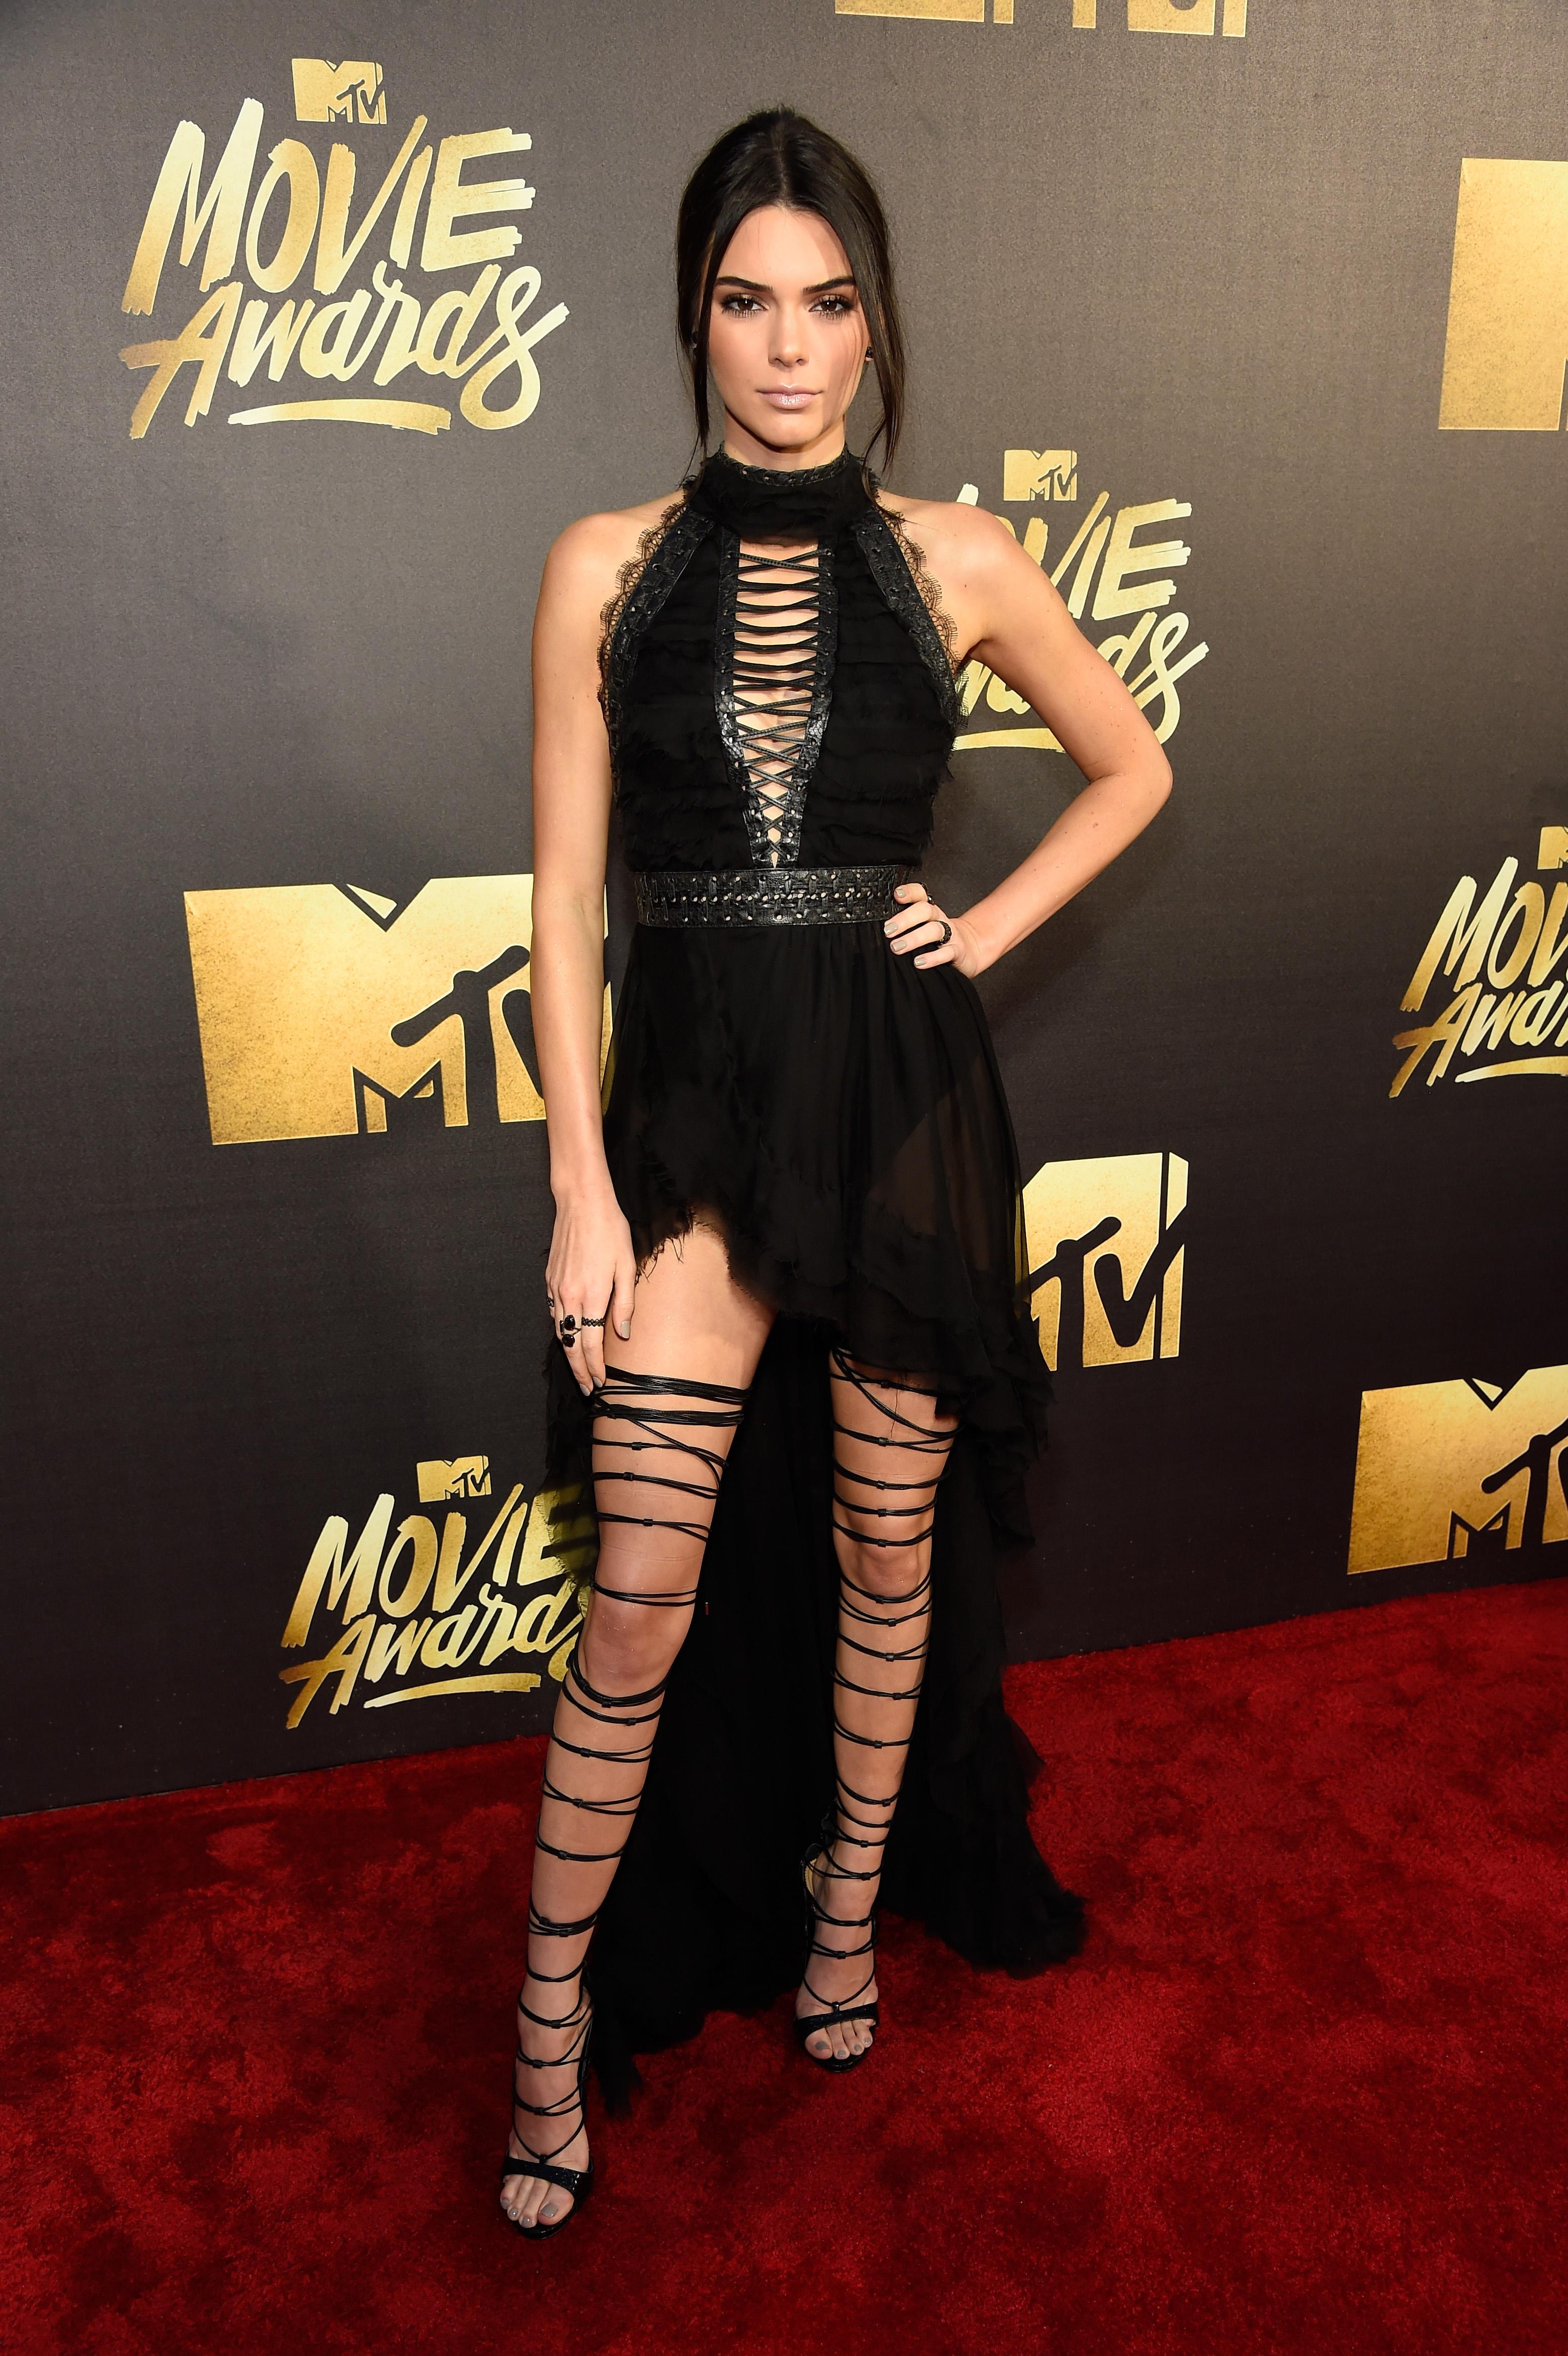 Kendall Jenner attends the 2016 MTV Movie Awards at Warner Bros. Studios on April 9, 2016 in Burbank, Calif.